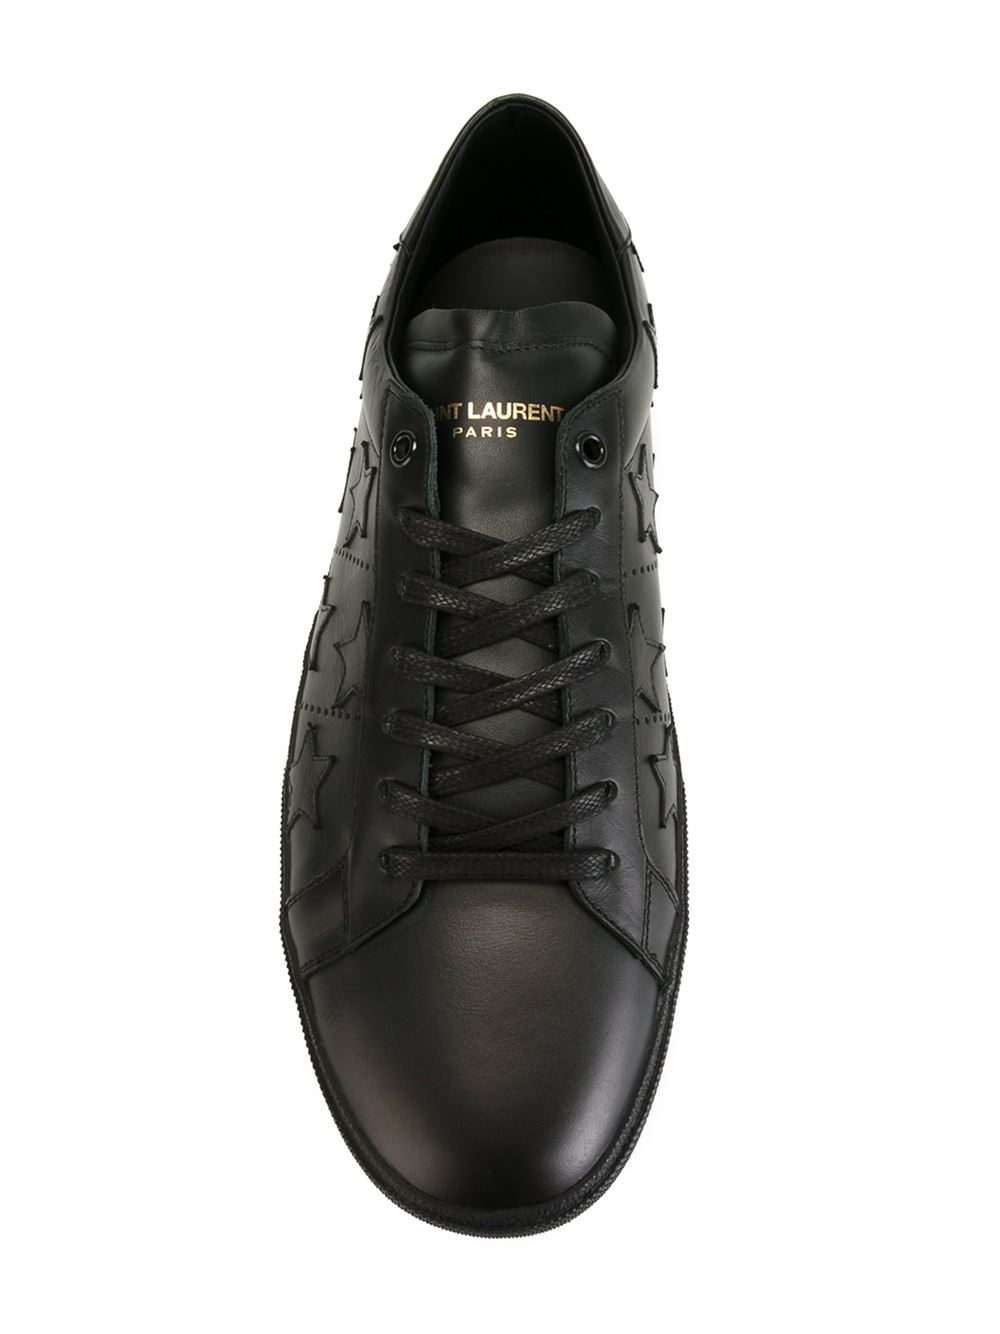 Saint laurent Leather Sneakers in Black | Lyst